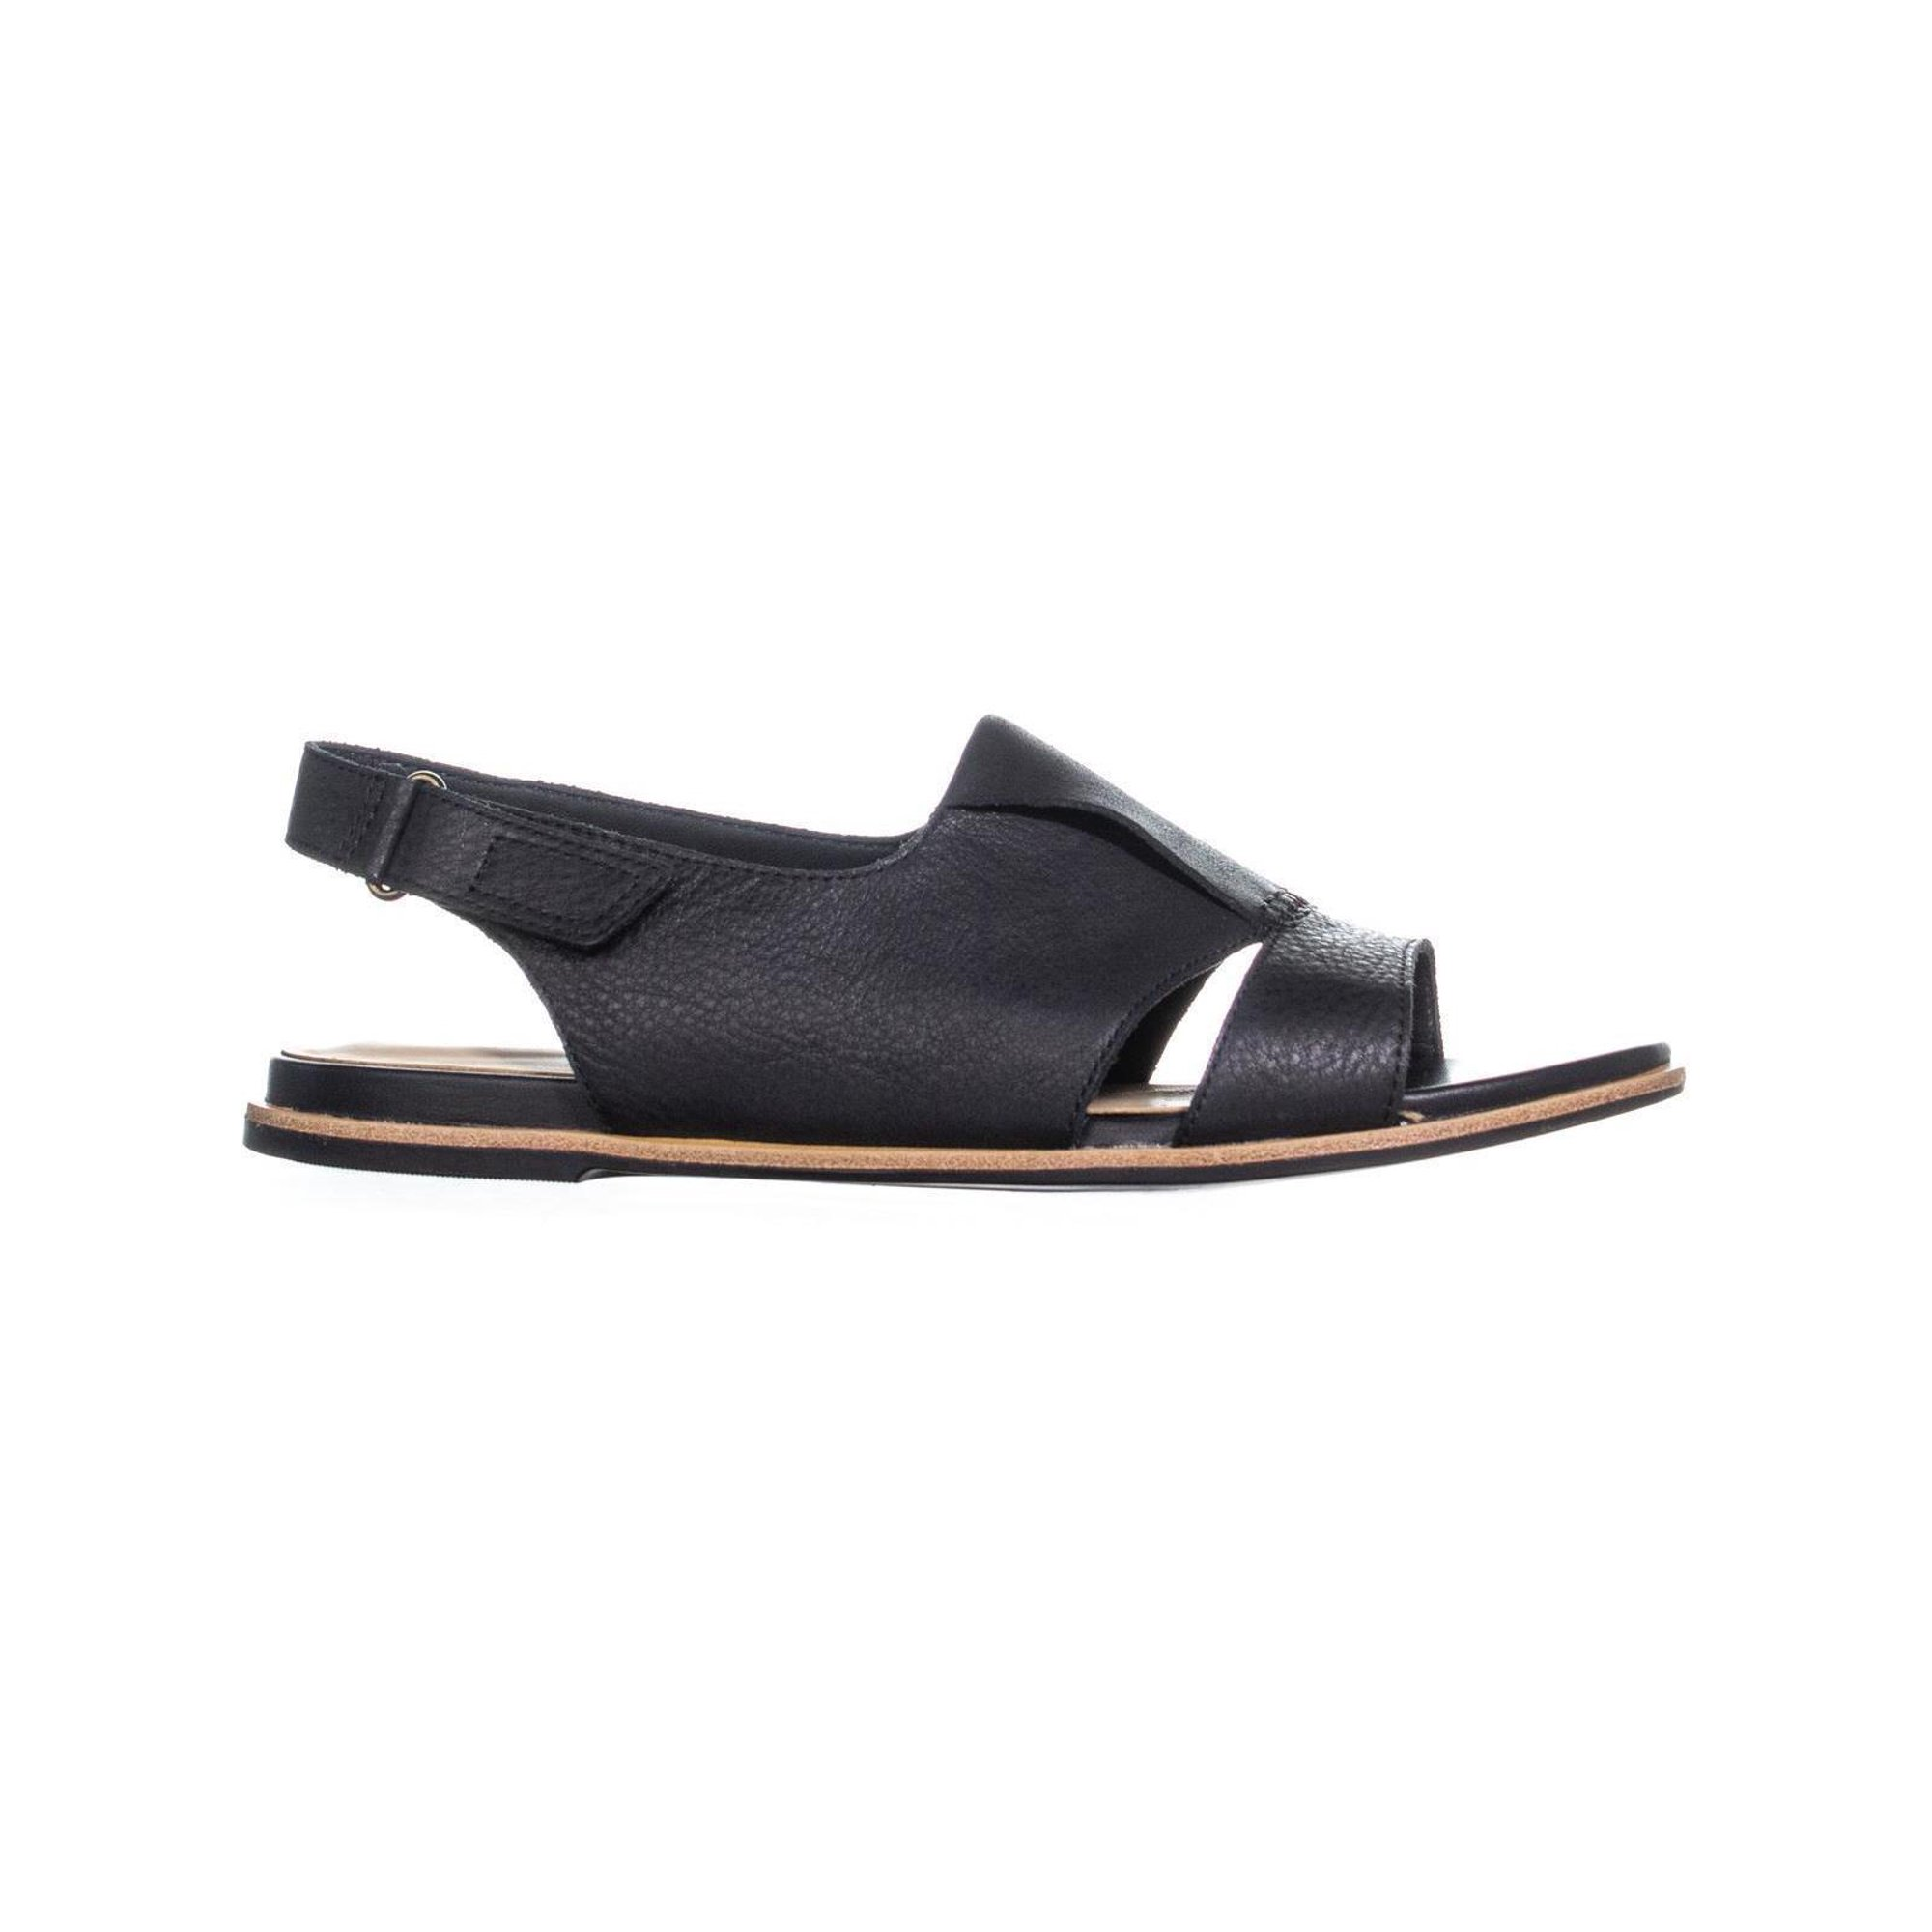 6237f897b1bf Clarks Sultana Rayne Flat Sandals